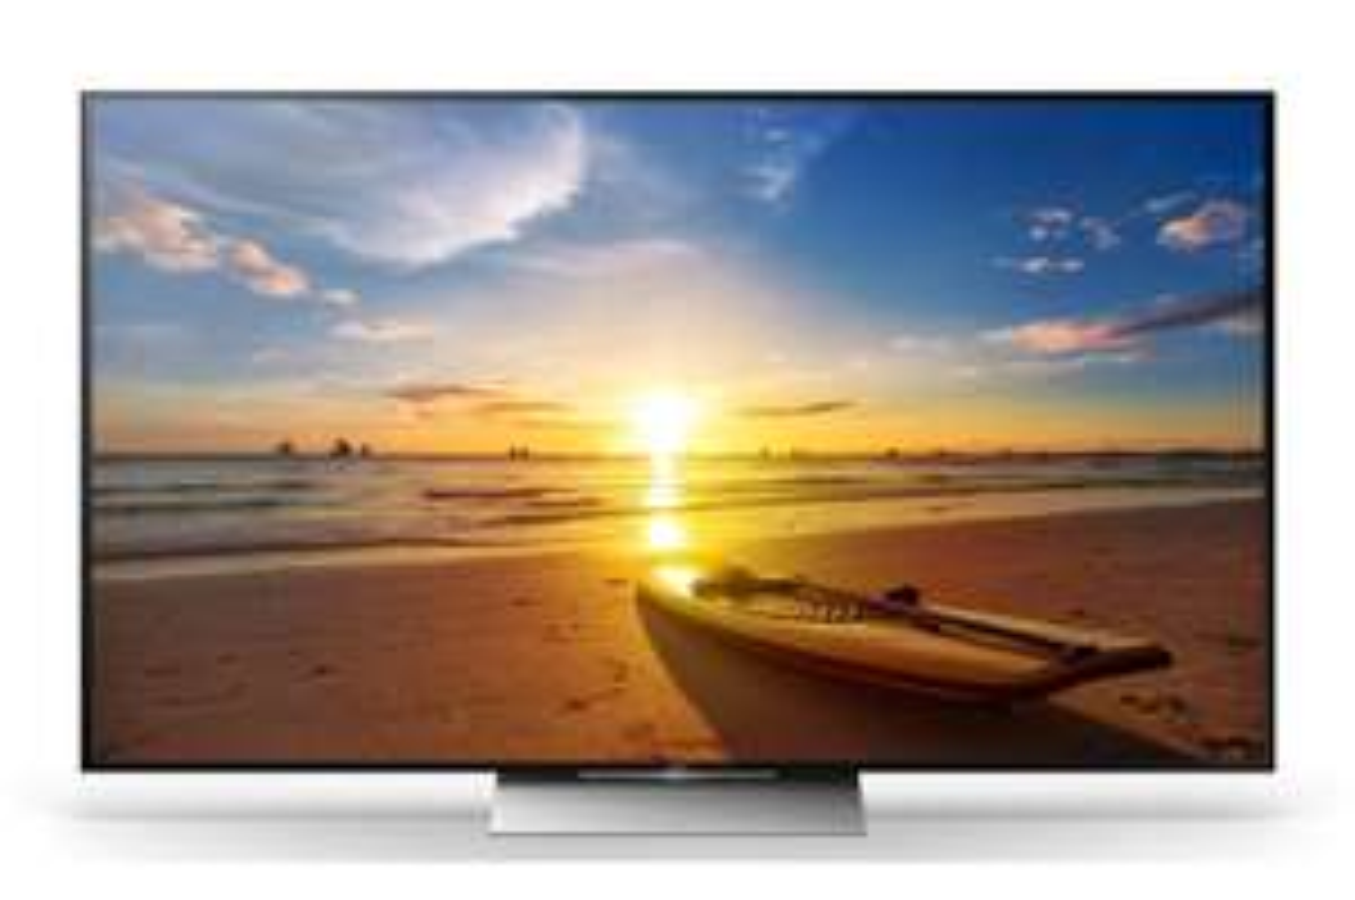 "TV Edge LED 55"" Sony KD55XD9305BAEP - UHD 4K, HDR, Slim Backlight Drive, Local Dimming, 3D, 100Hz, Motionflow XR 1000Hz, Smart TV (Via ODR 200€)"